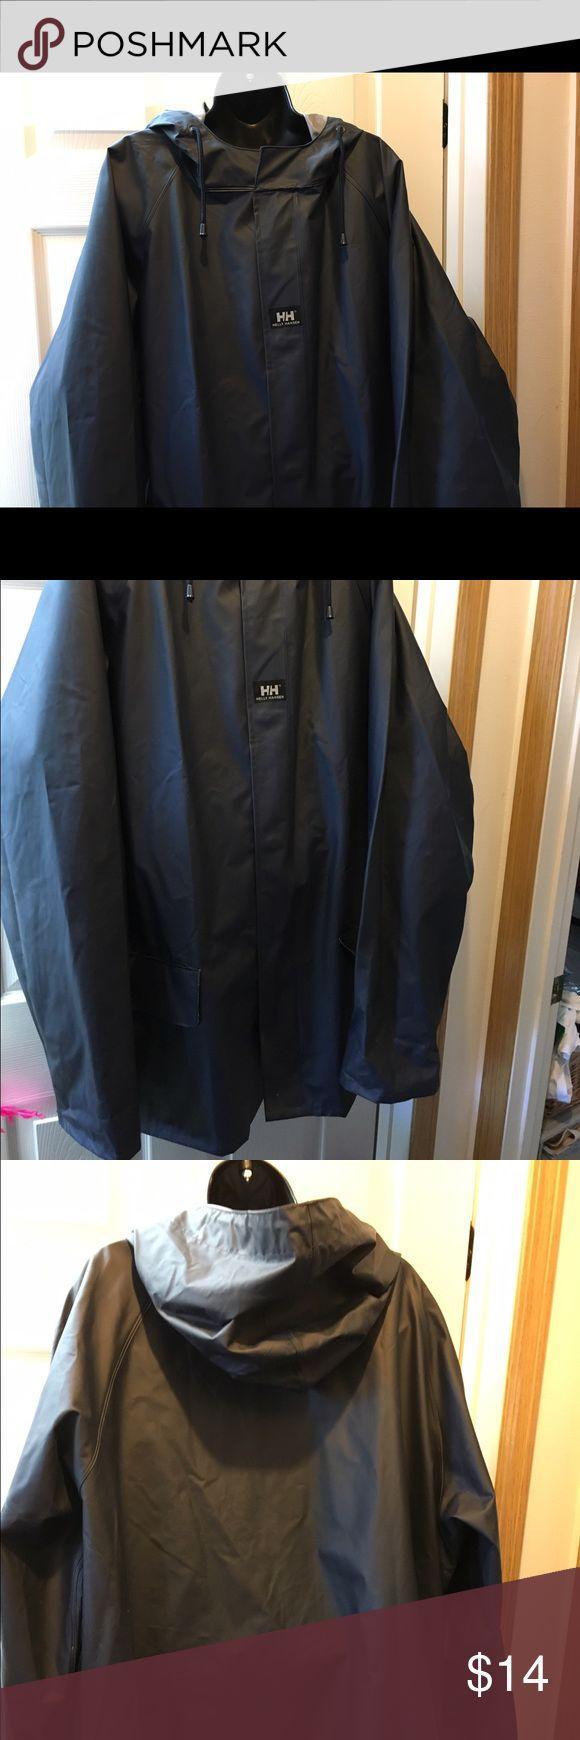 Helly Hansen Rain jacket Jacket is in new condition!  Rarely used. Helly Hansen Jackets & Coats Raincoats